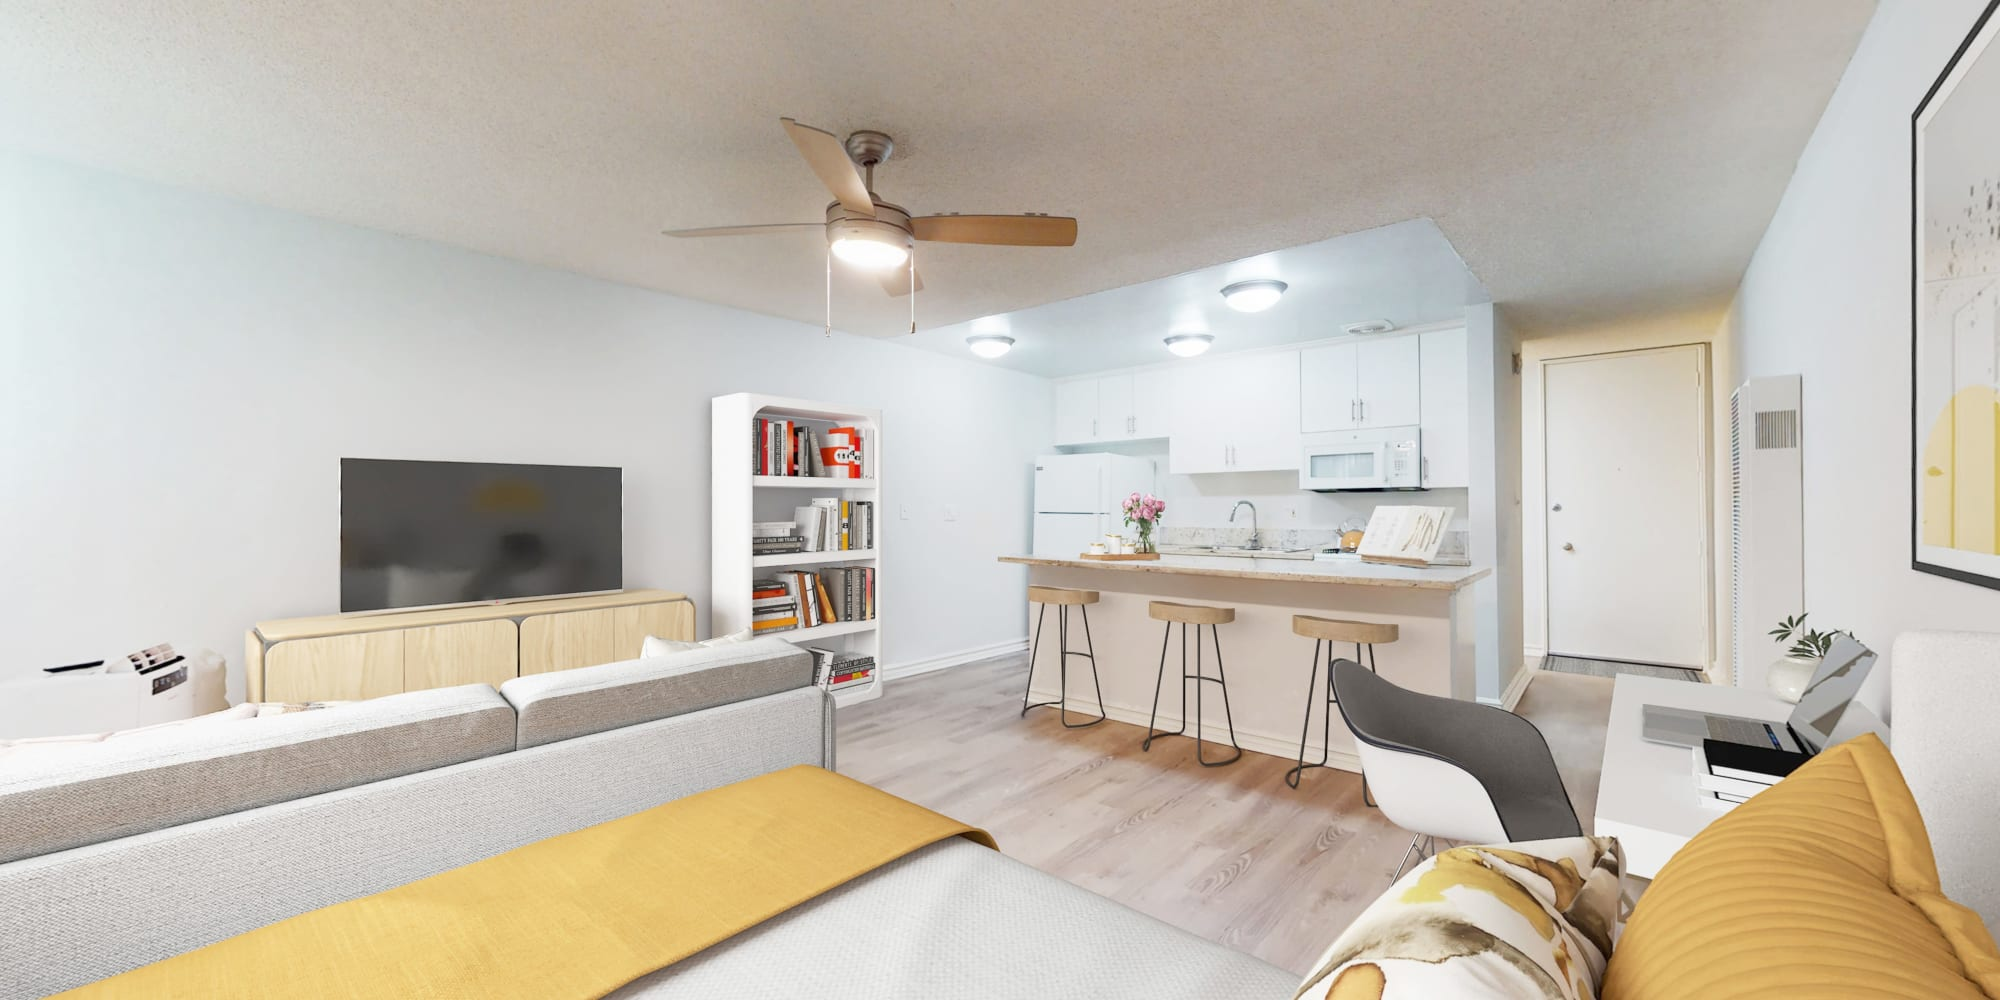 Studio model apartment view towards kitchenette space at Casa Granada in Los Angeles, California